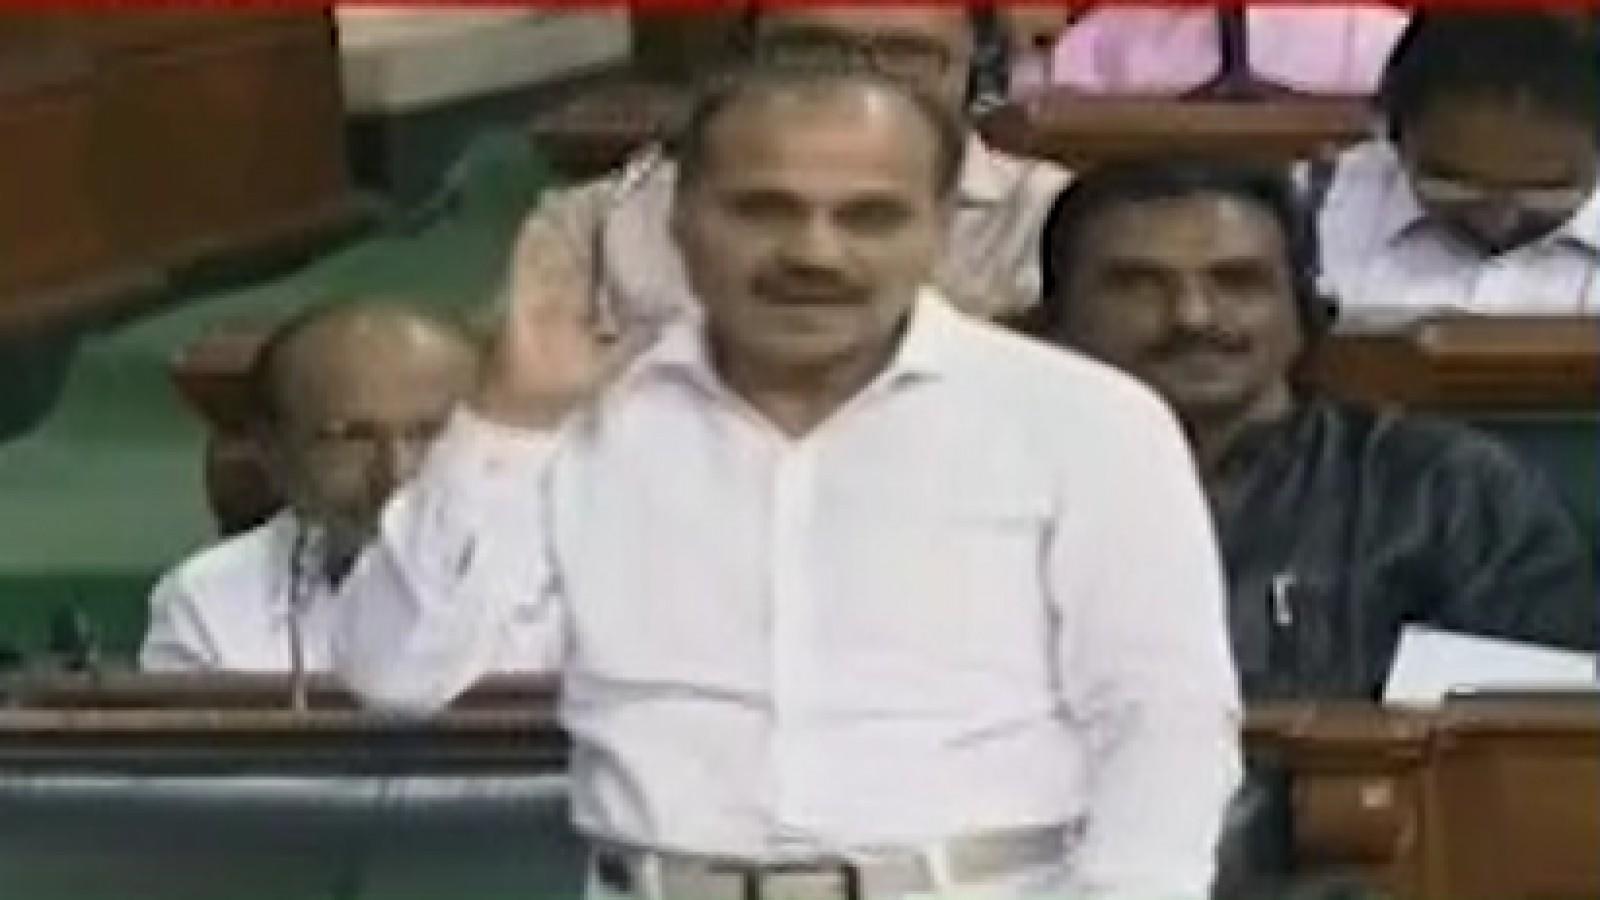 congress-leader-adhir-ranjan-chowdhury-attacks-pm-modi-calls-him-gandi-naali